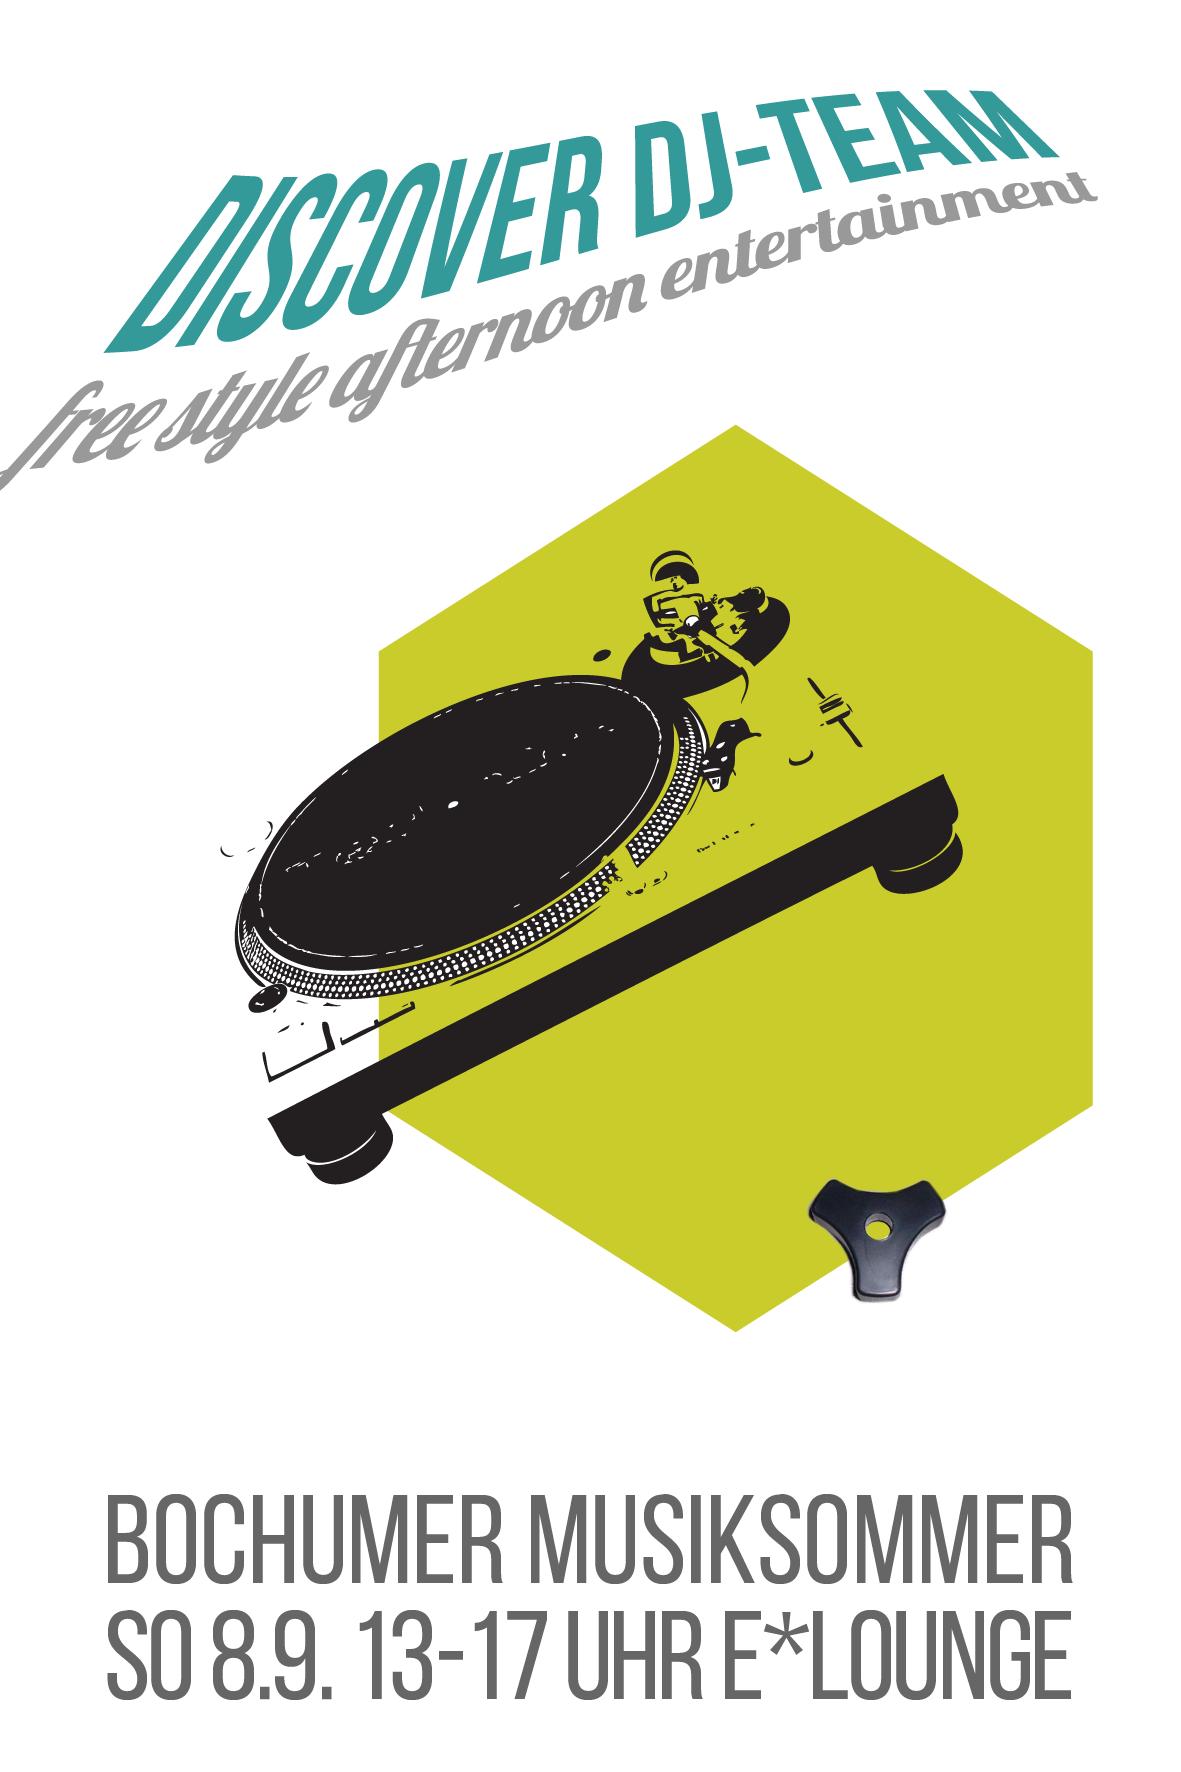 DISCOVER DJ Team beim Musiksommer